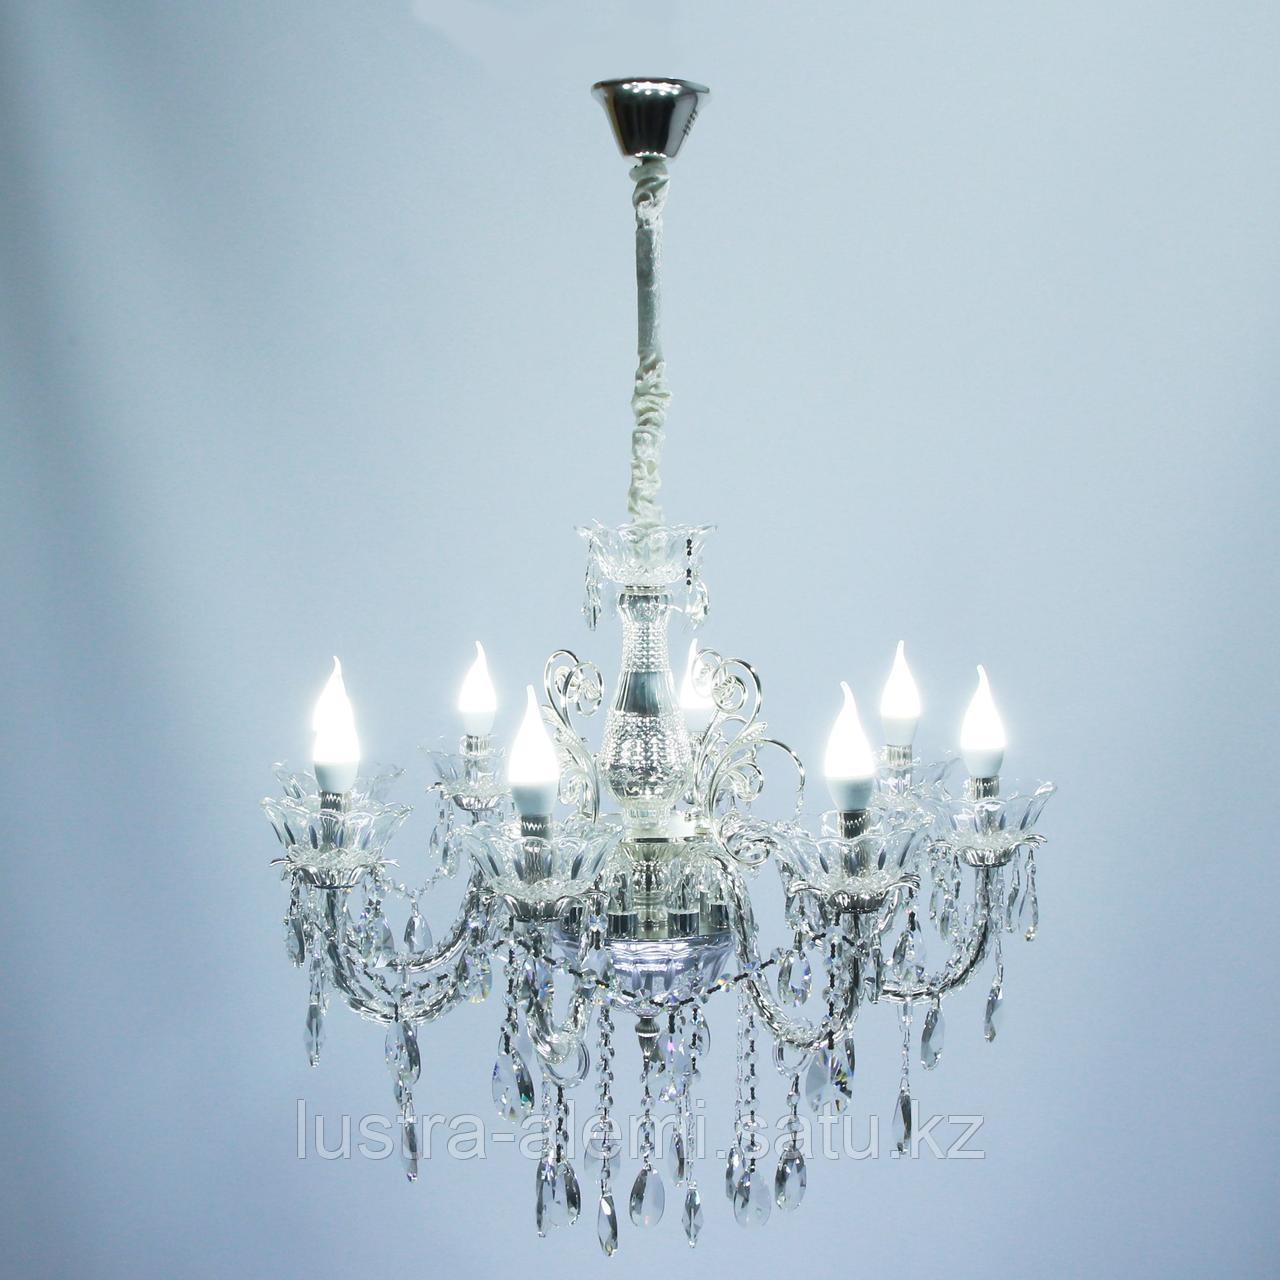 Люстра Классика 4016/8 Silver